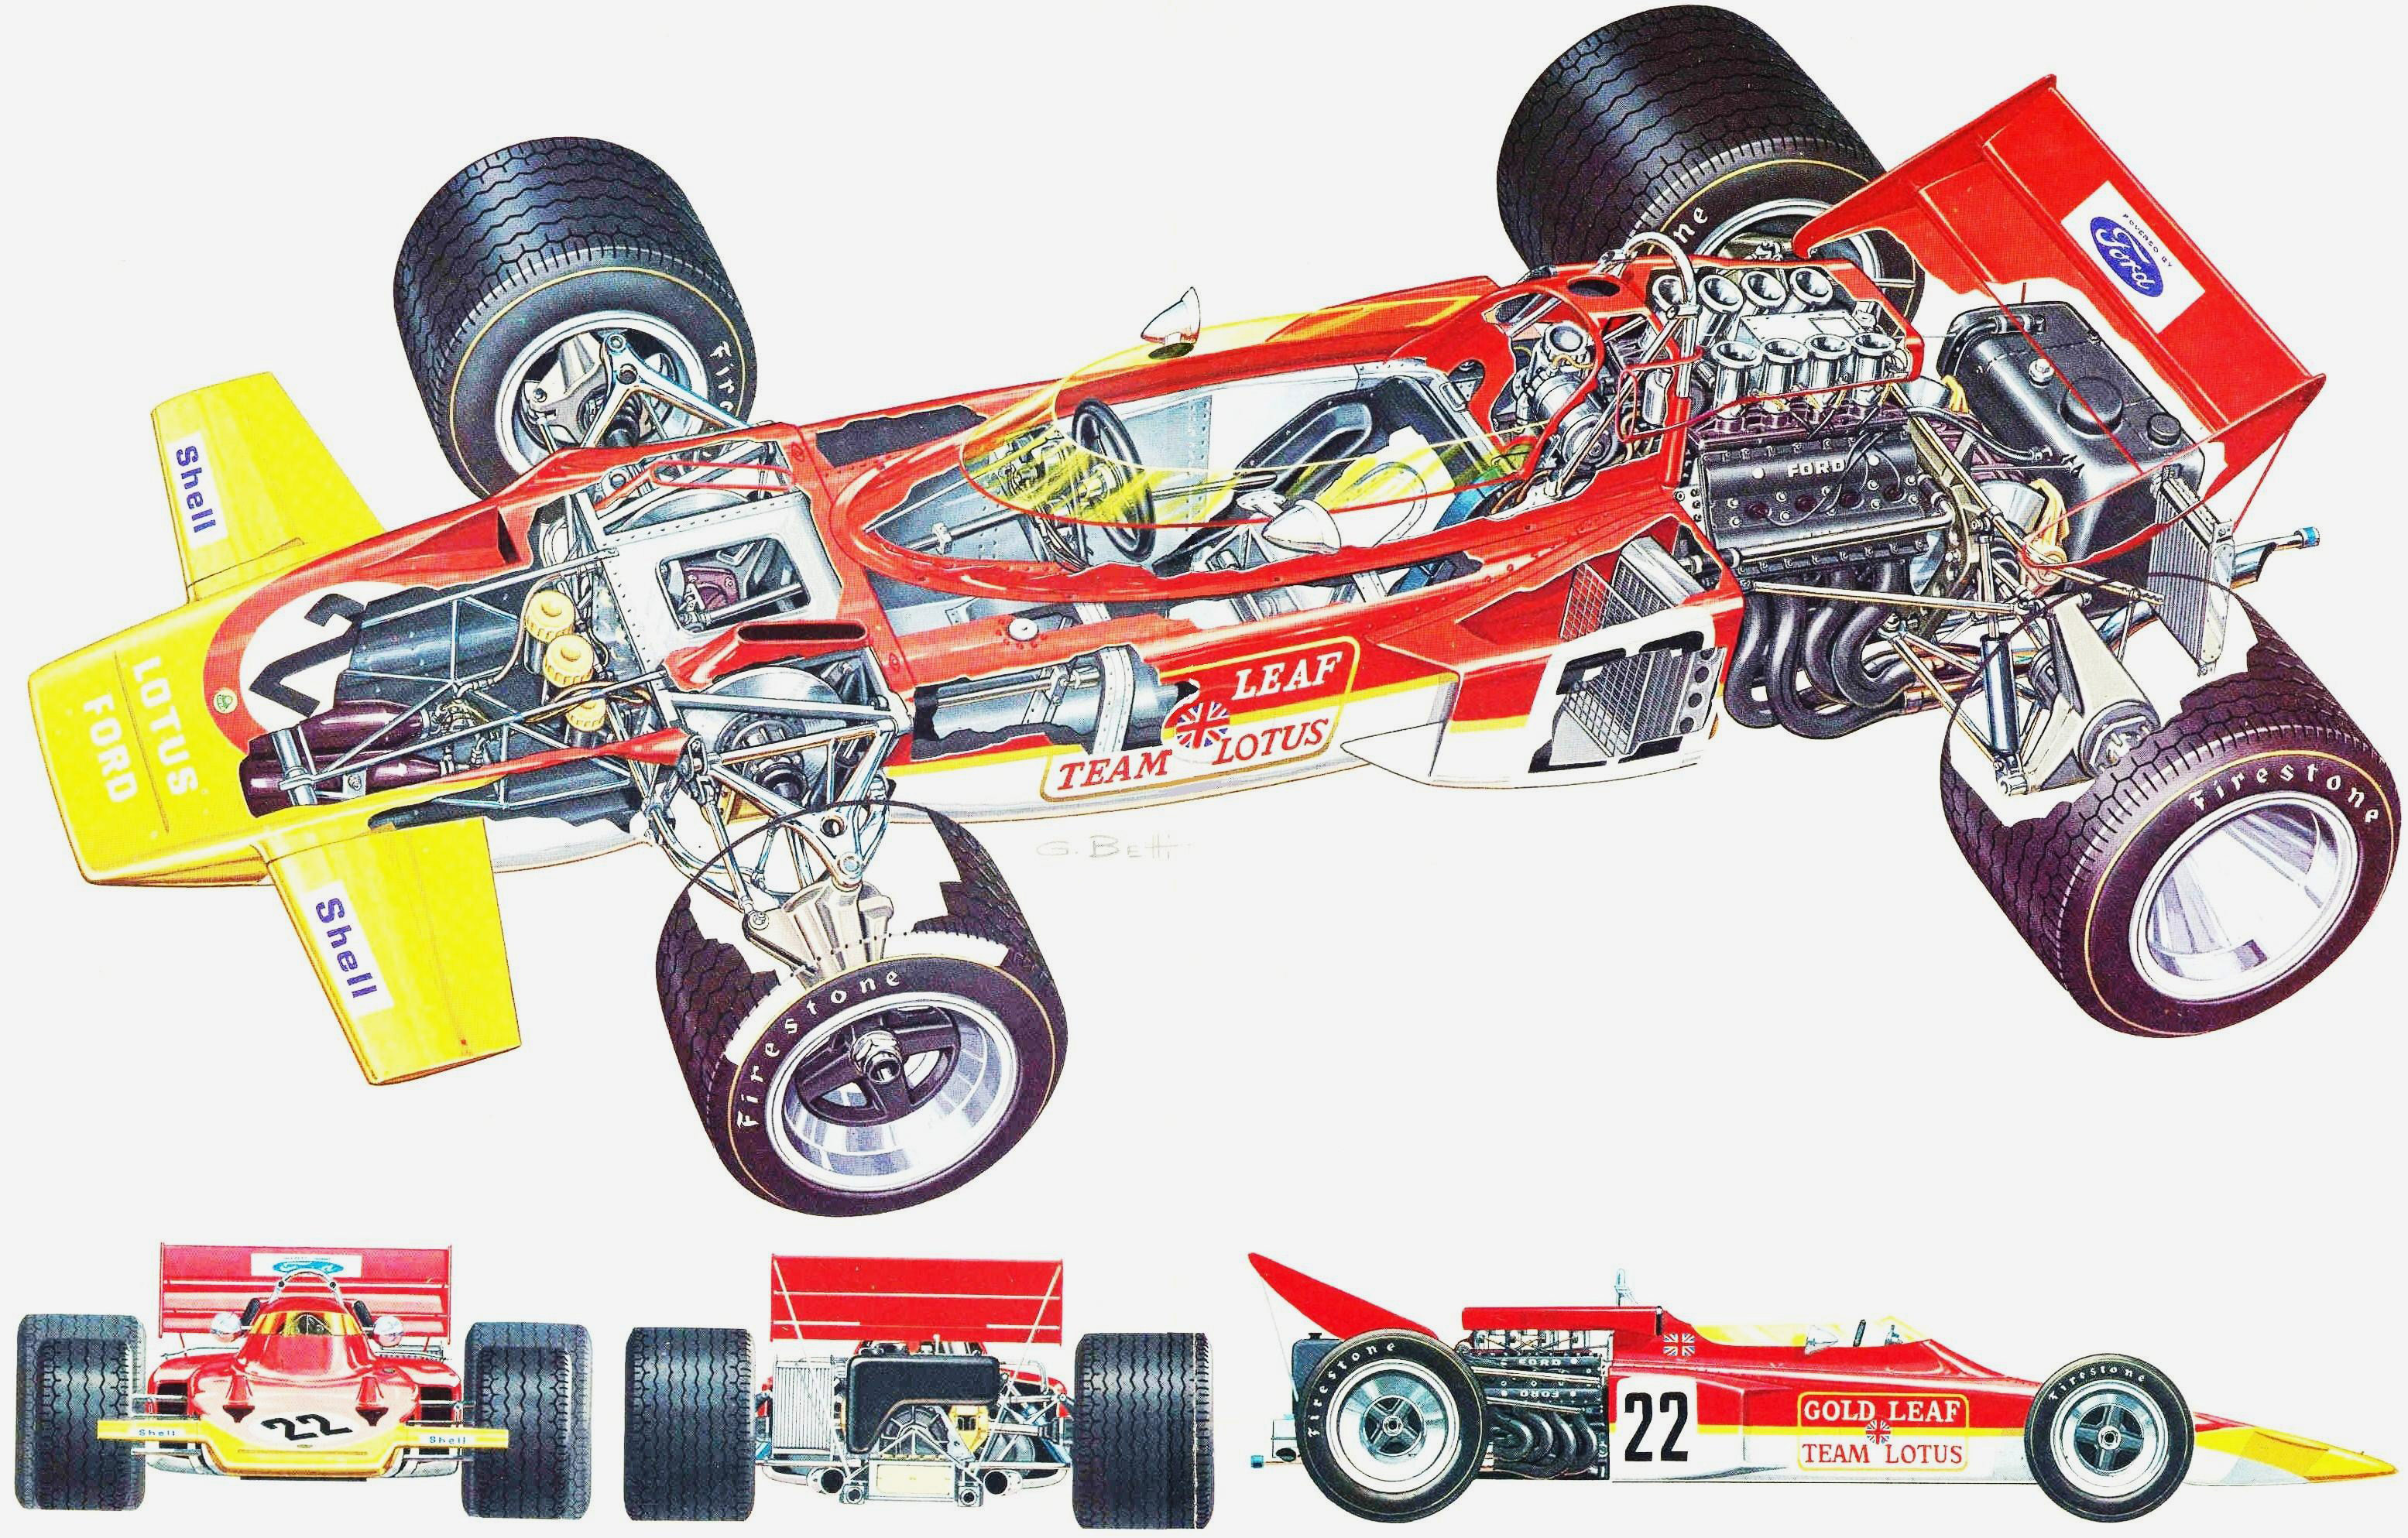 Lotus 72 cutaway